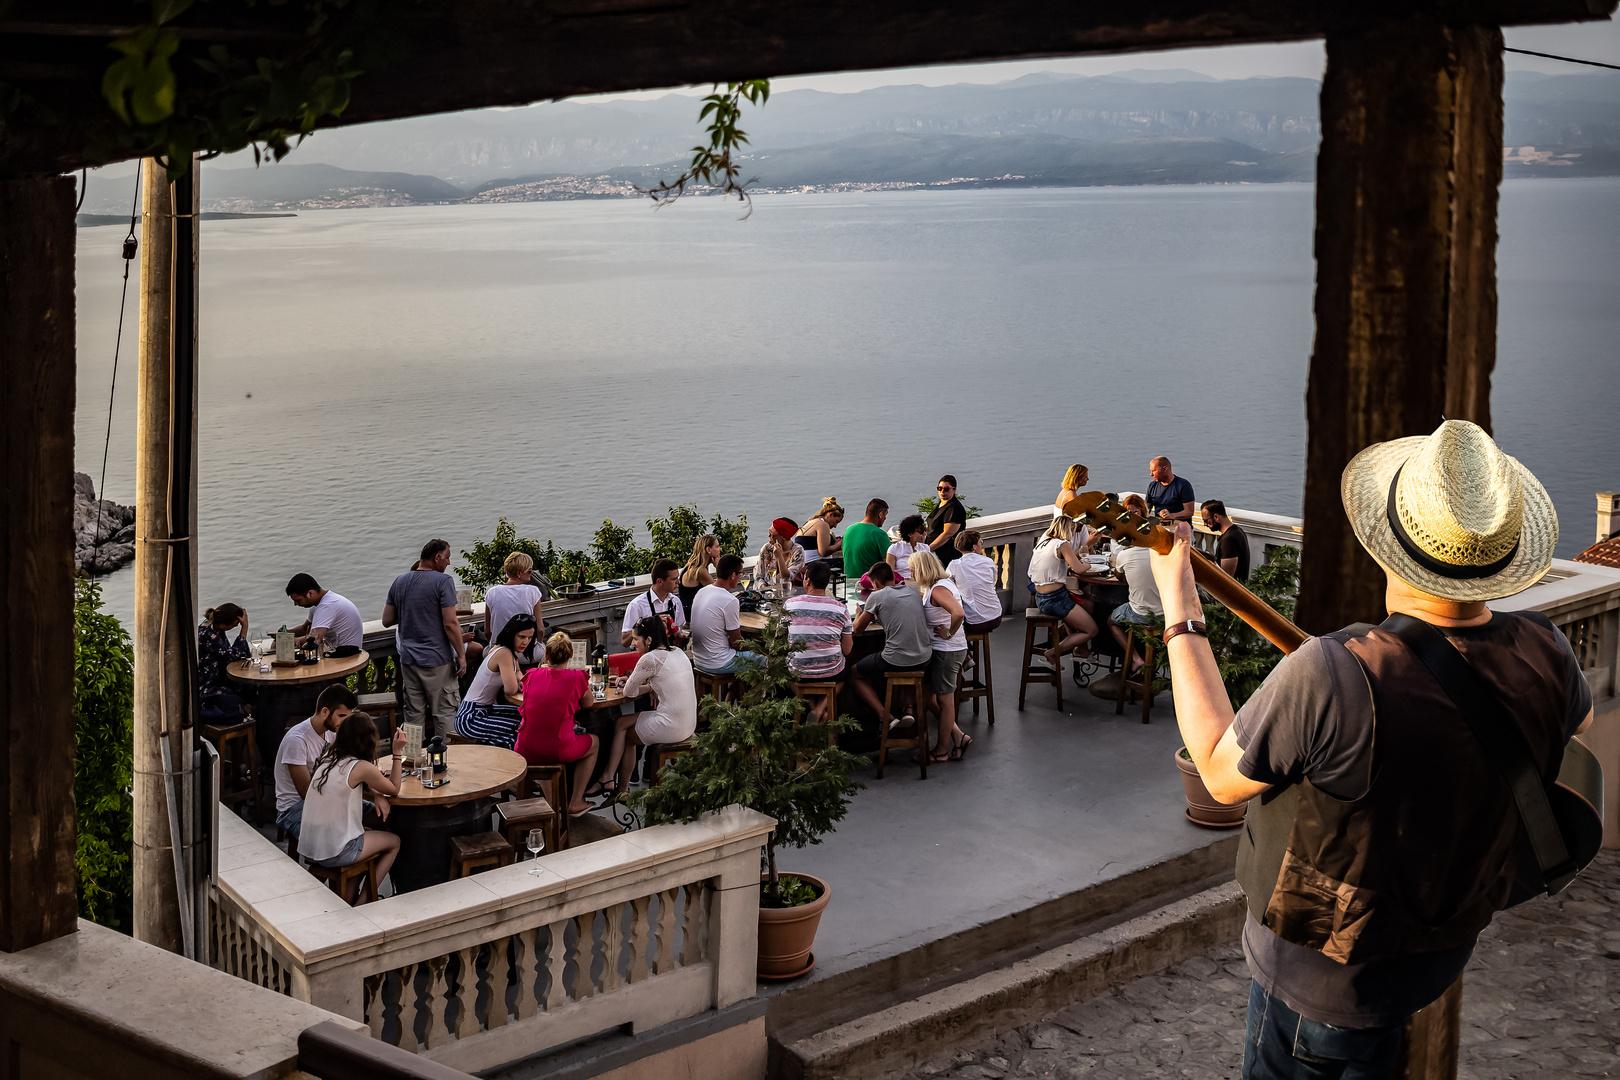 Restaurant con música